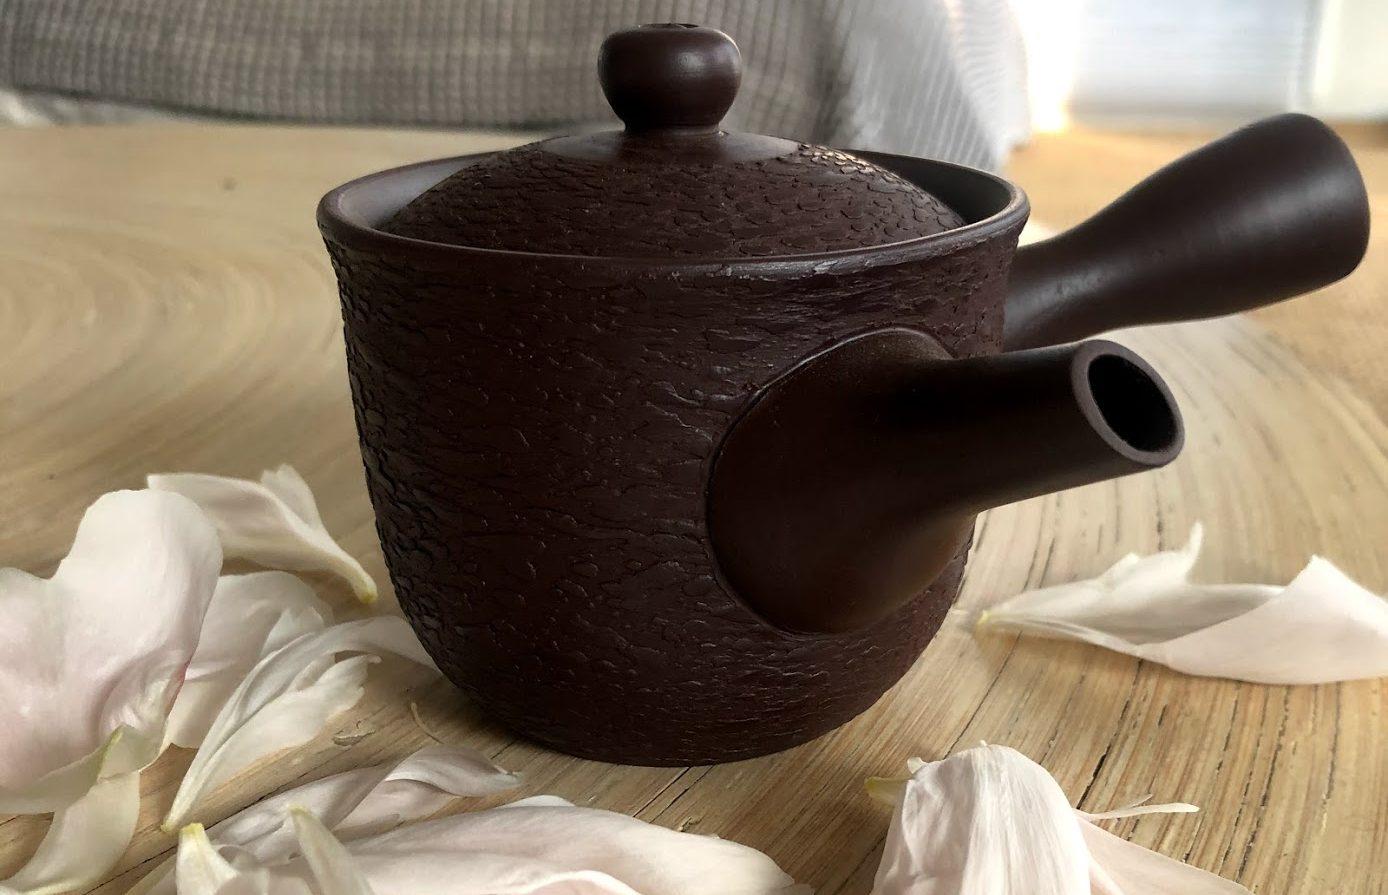 Set giapponese per il tè con teiera kyushu